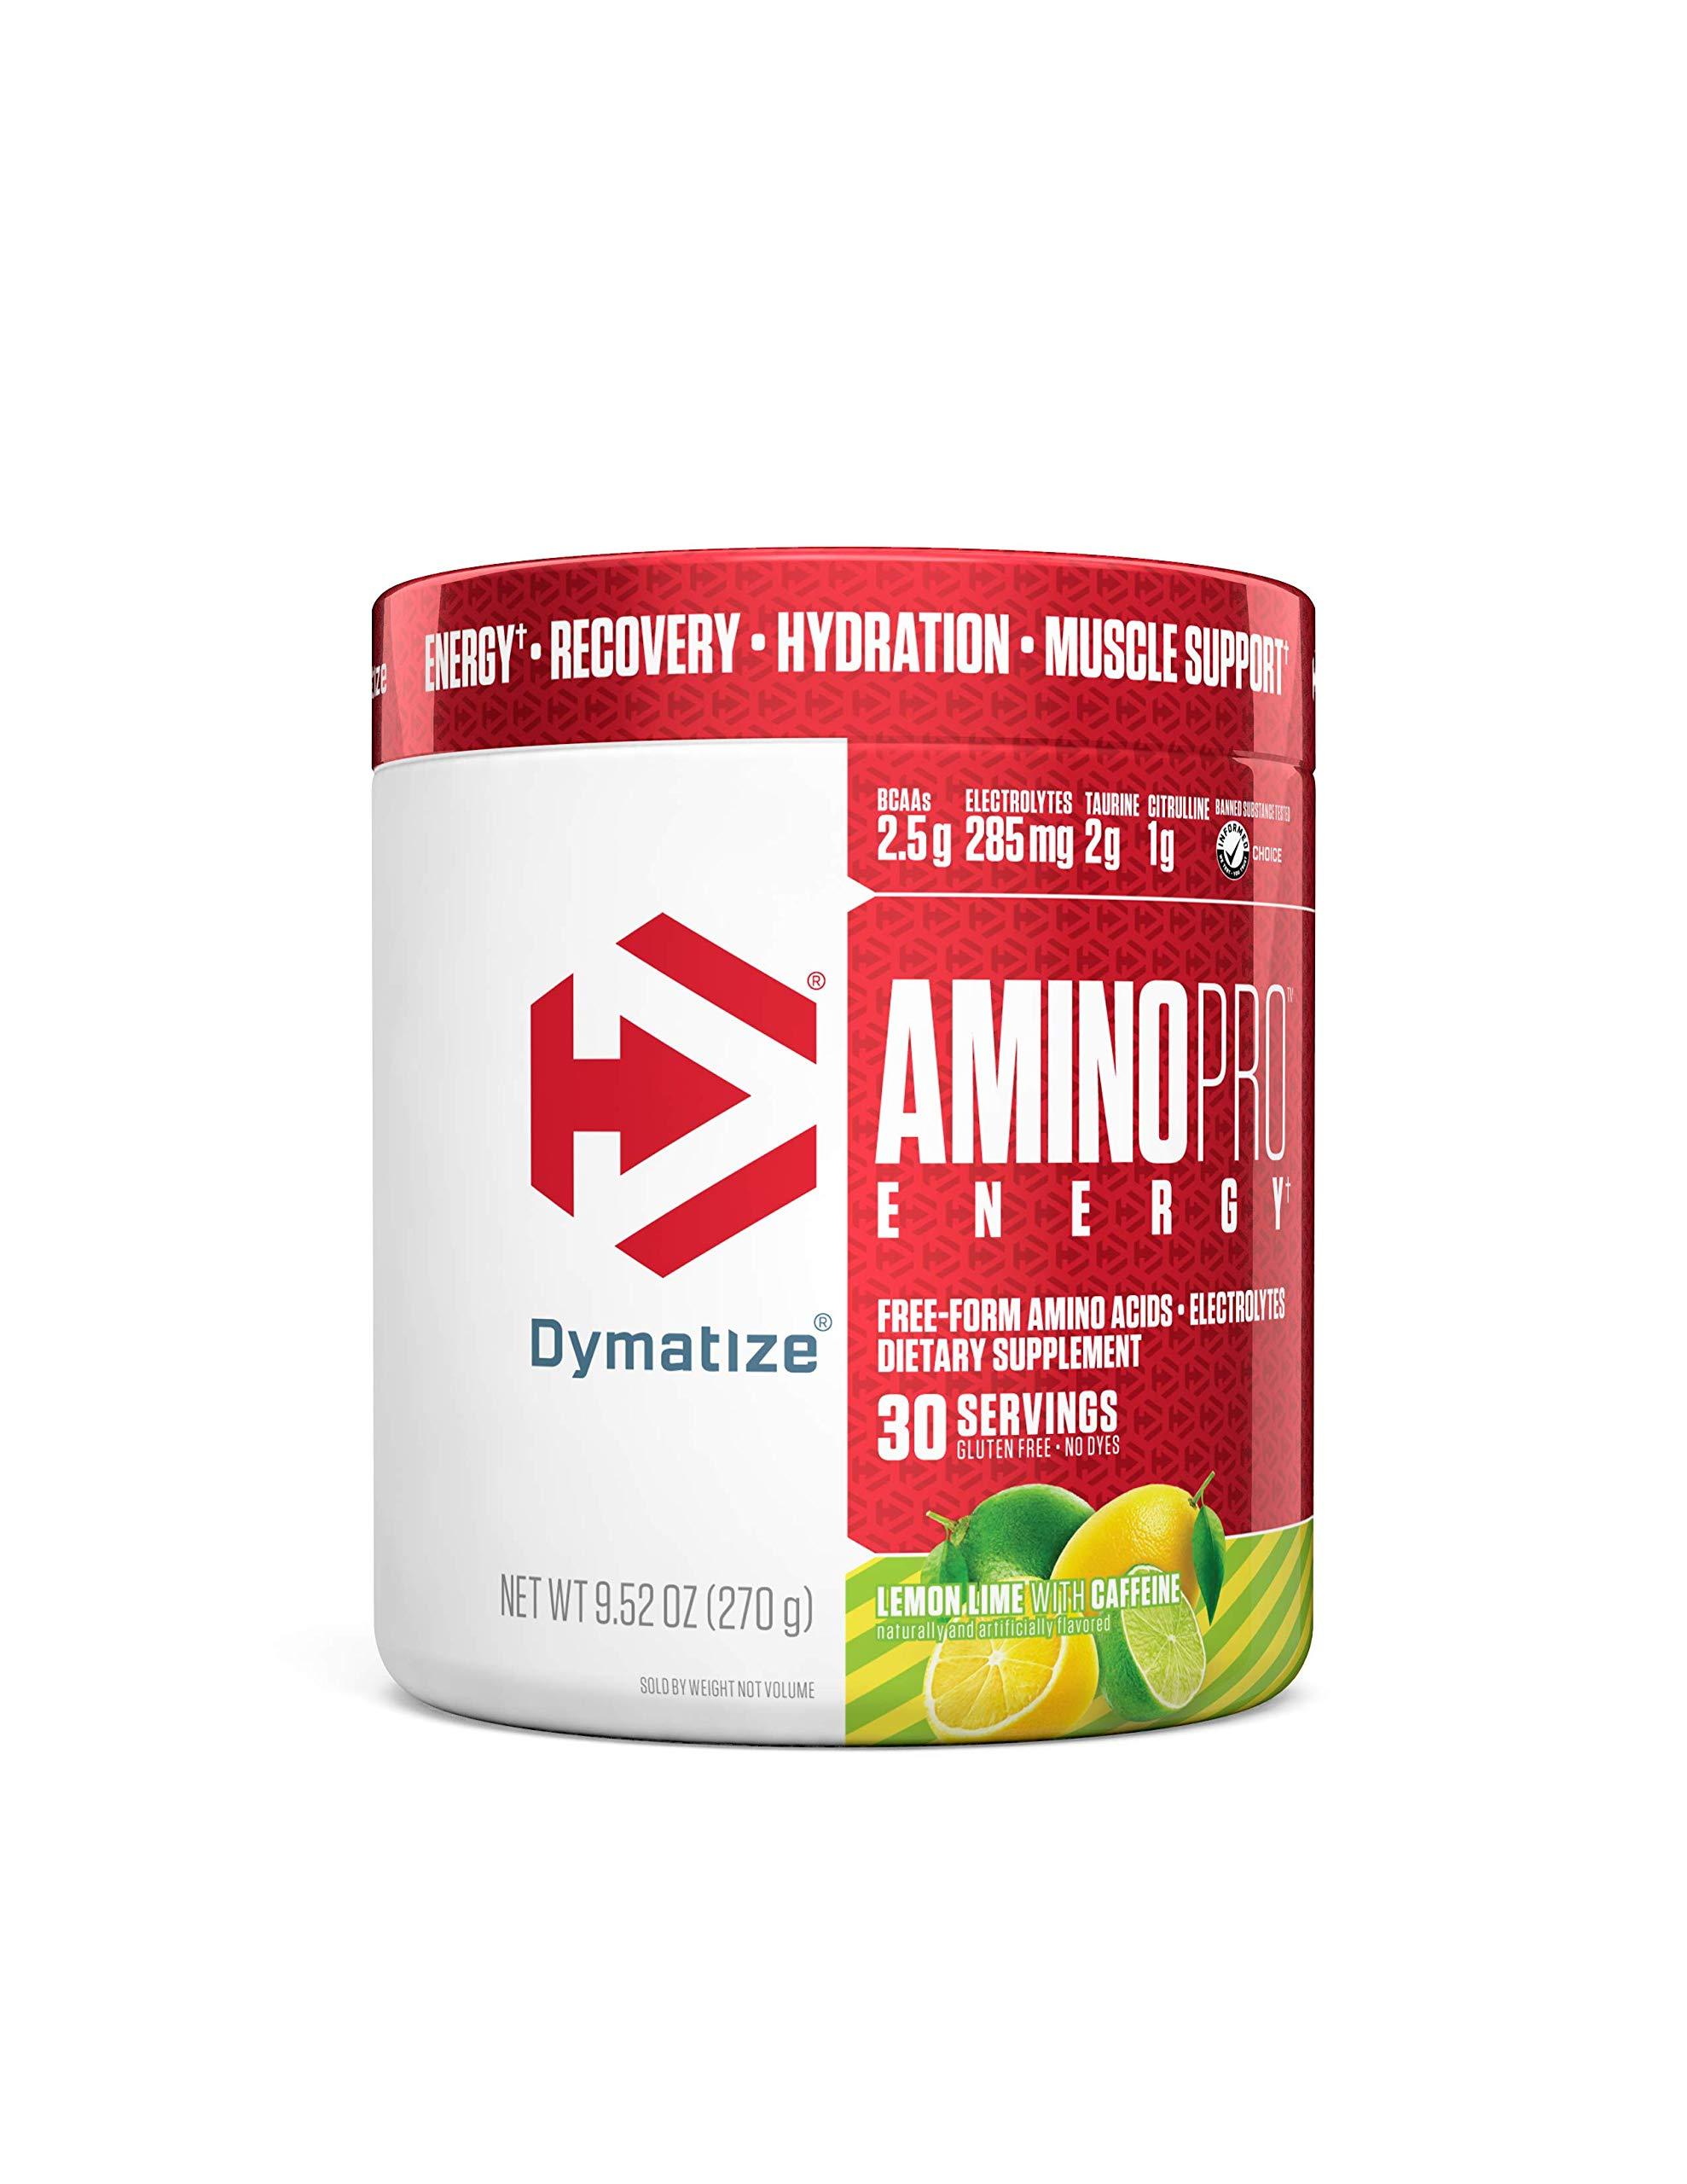 Dymatize AminoPro + Energy Endurance Amplifier Powder, Reinforced with Caffeine, Electrolytes & Amino Acids, Lemon Lime, 9.52 Oz